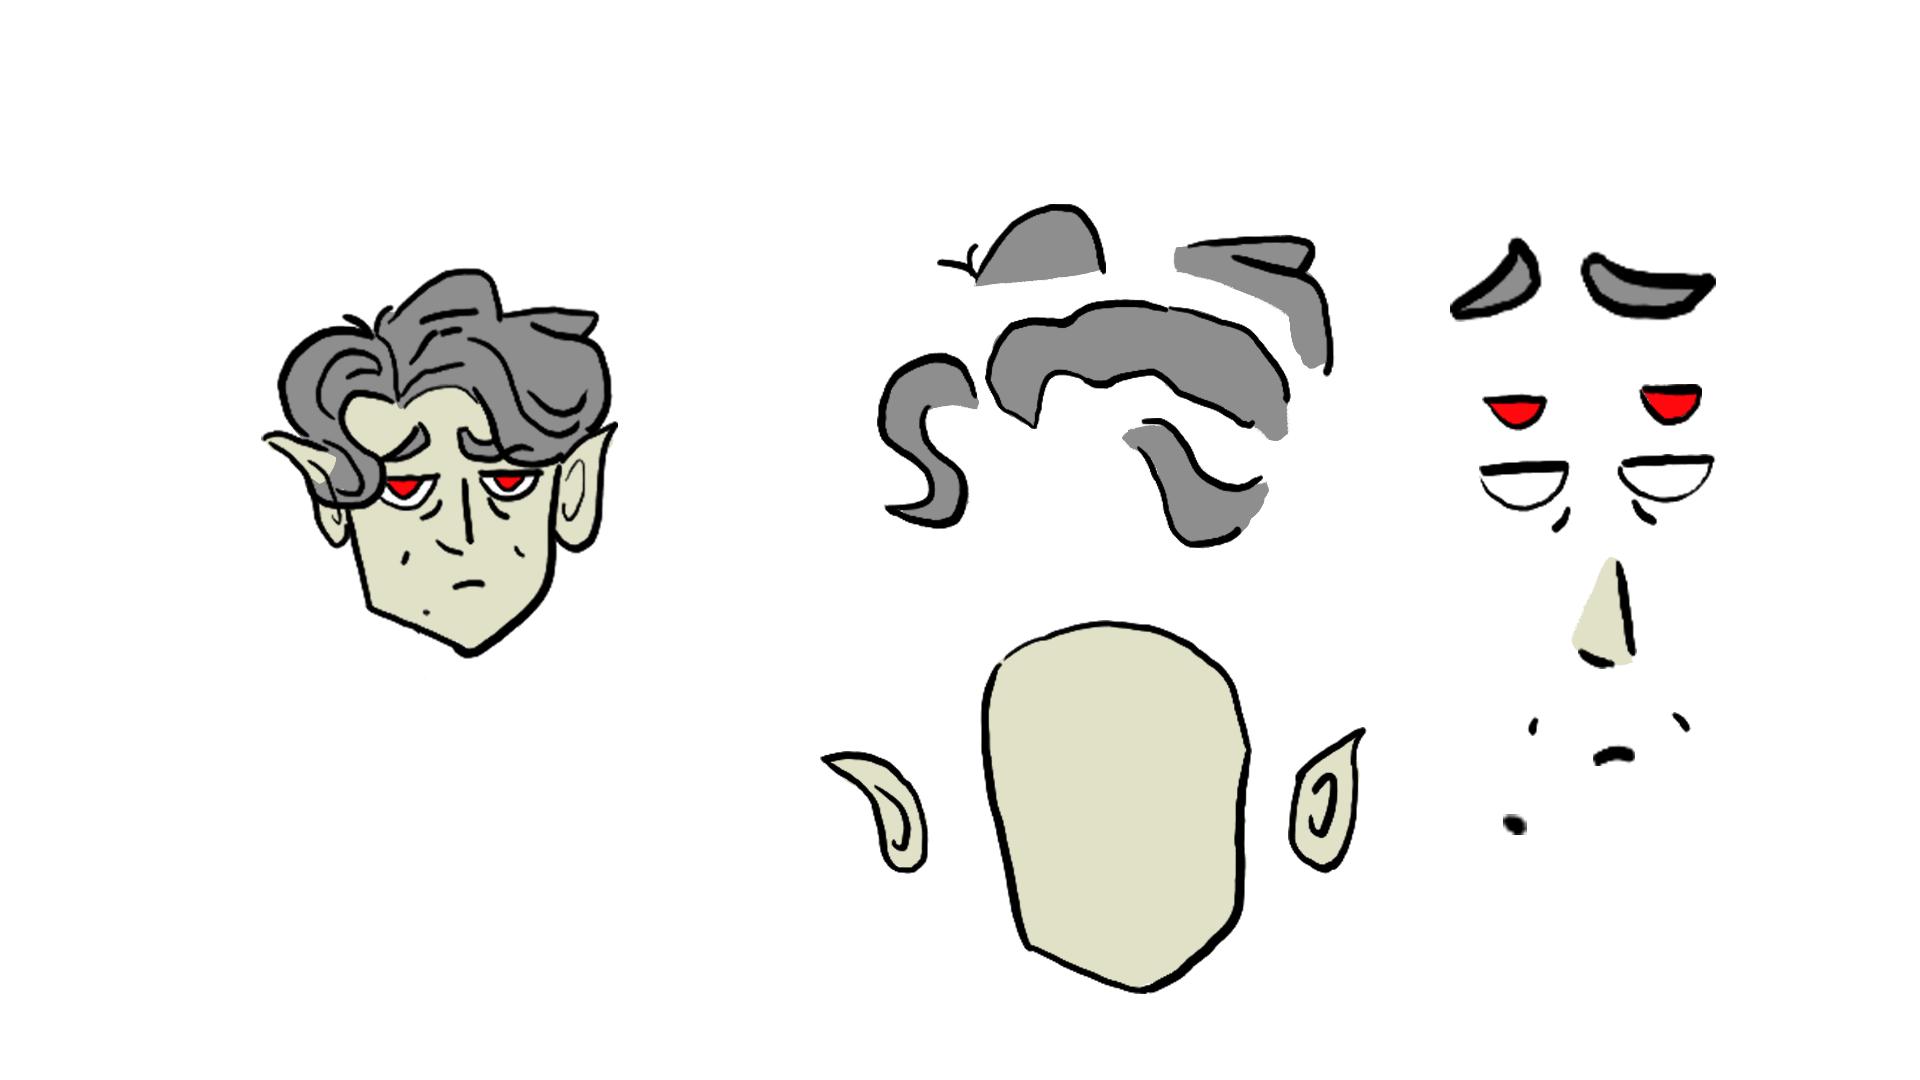 Batthew - Face and hair breakdown